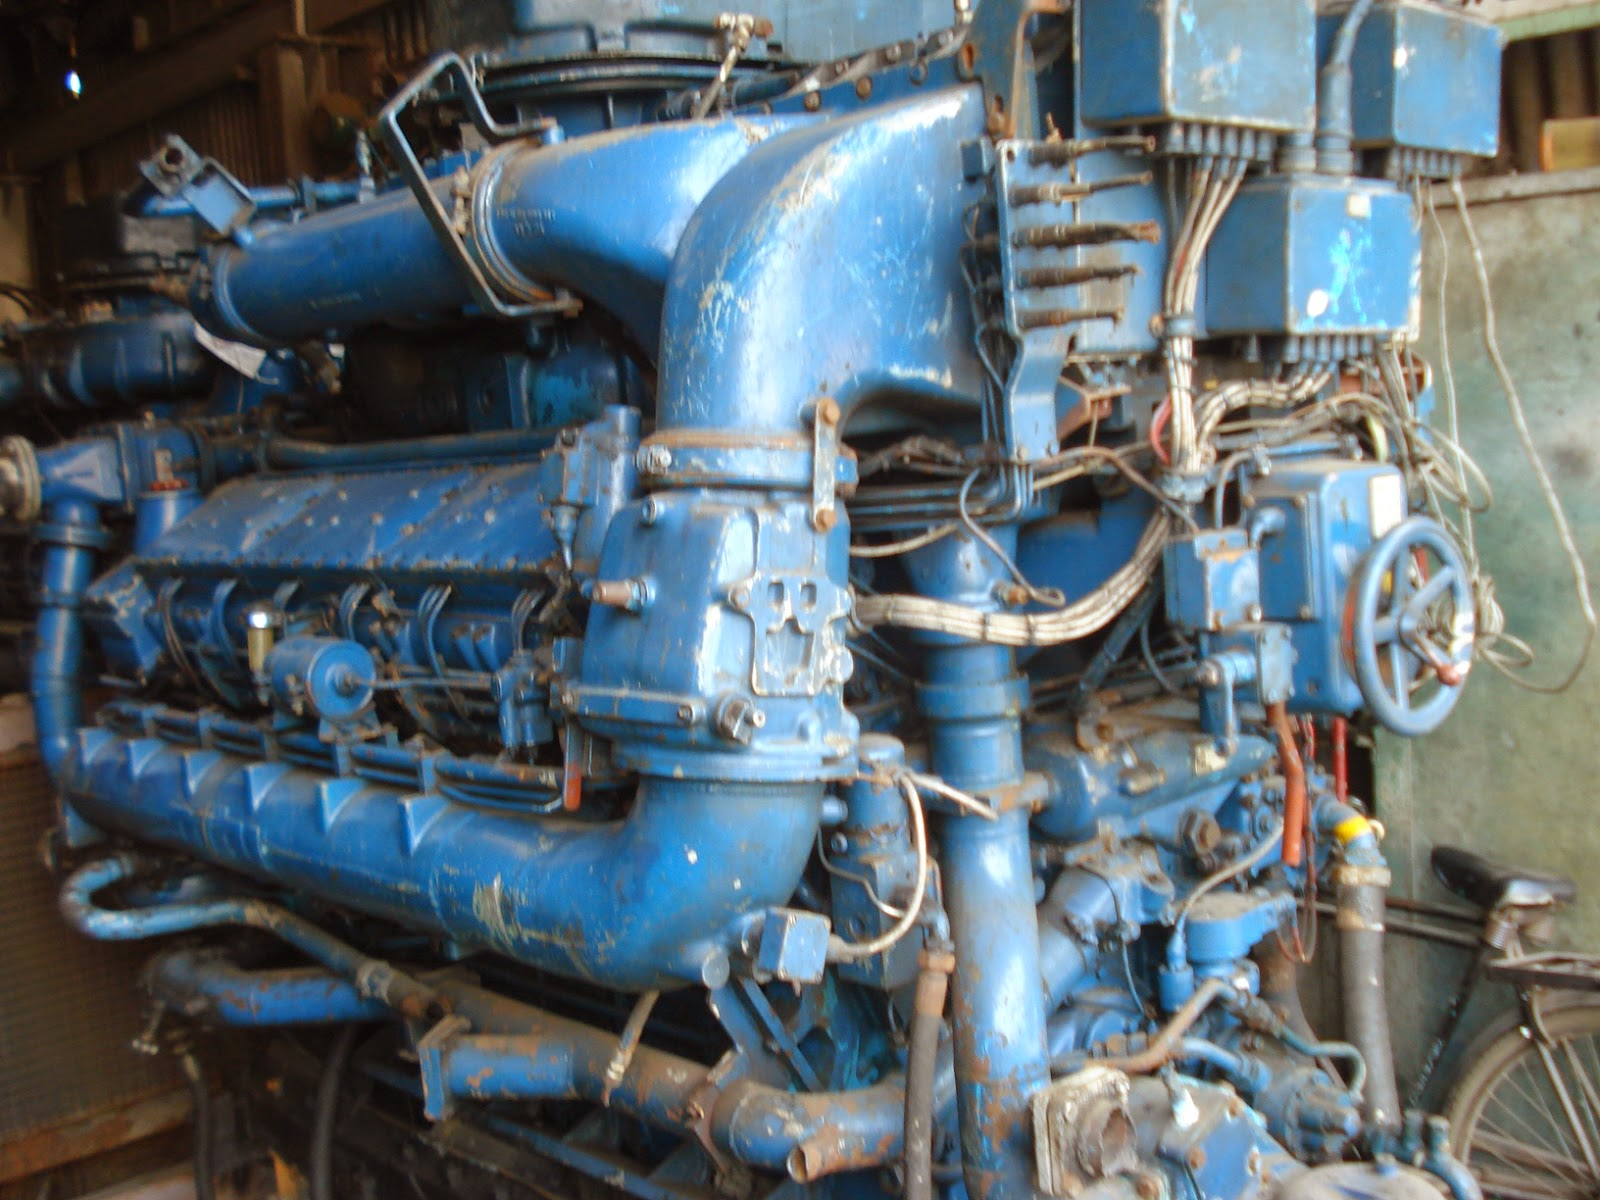 MTU marine engines, MTU propulsion engines, rolls royce